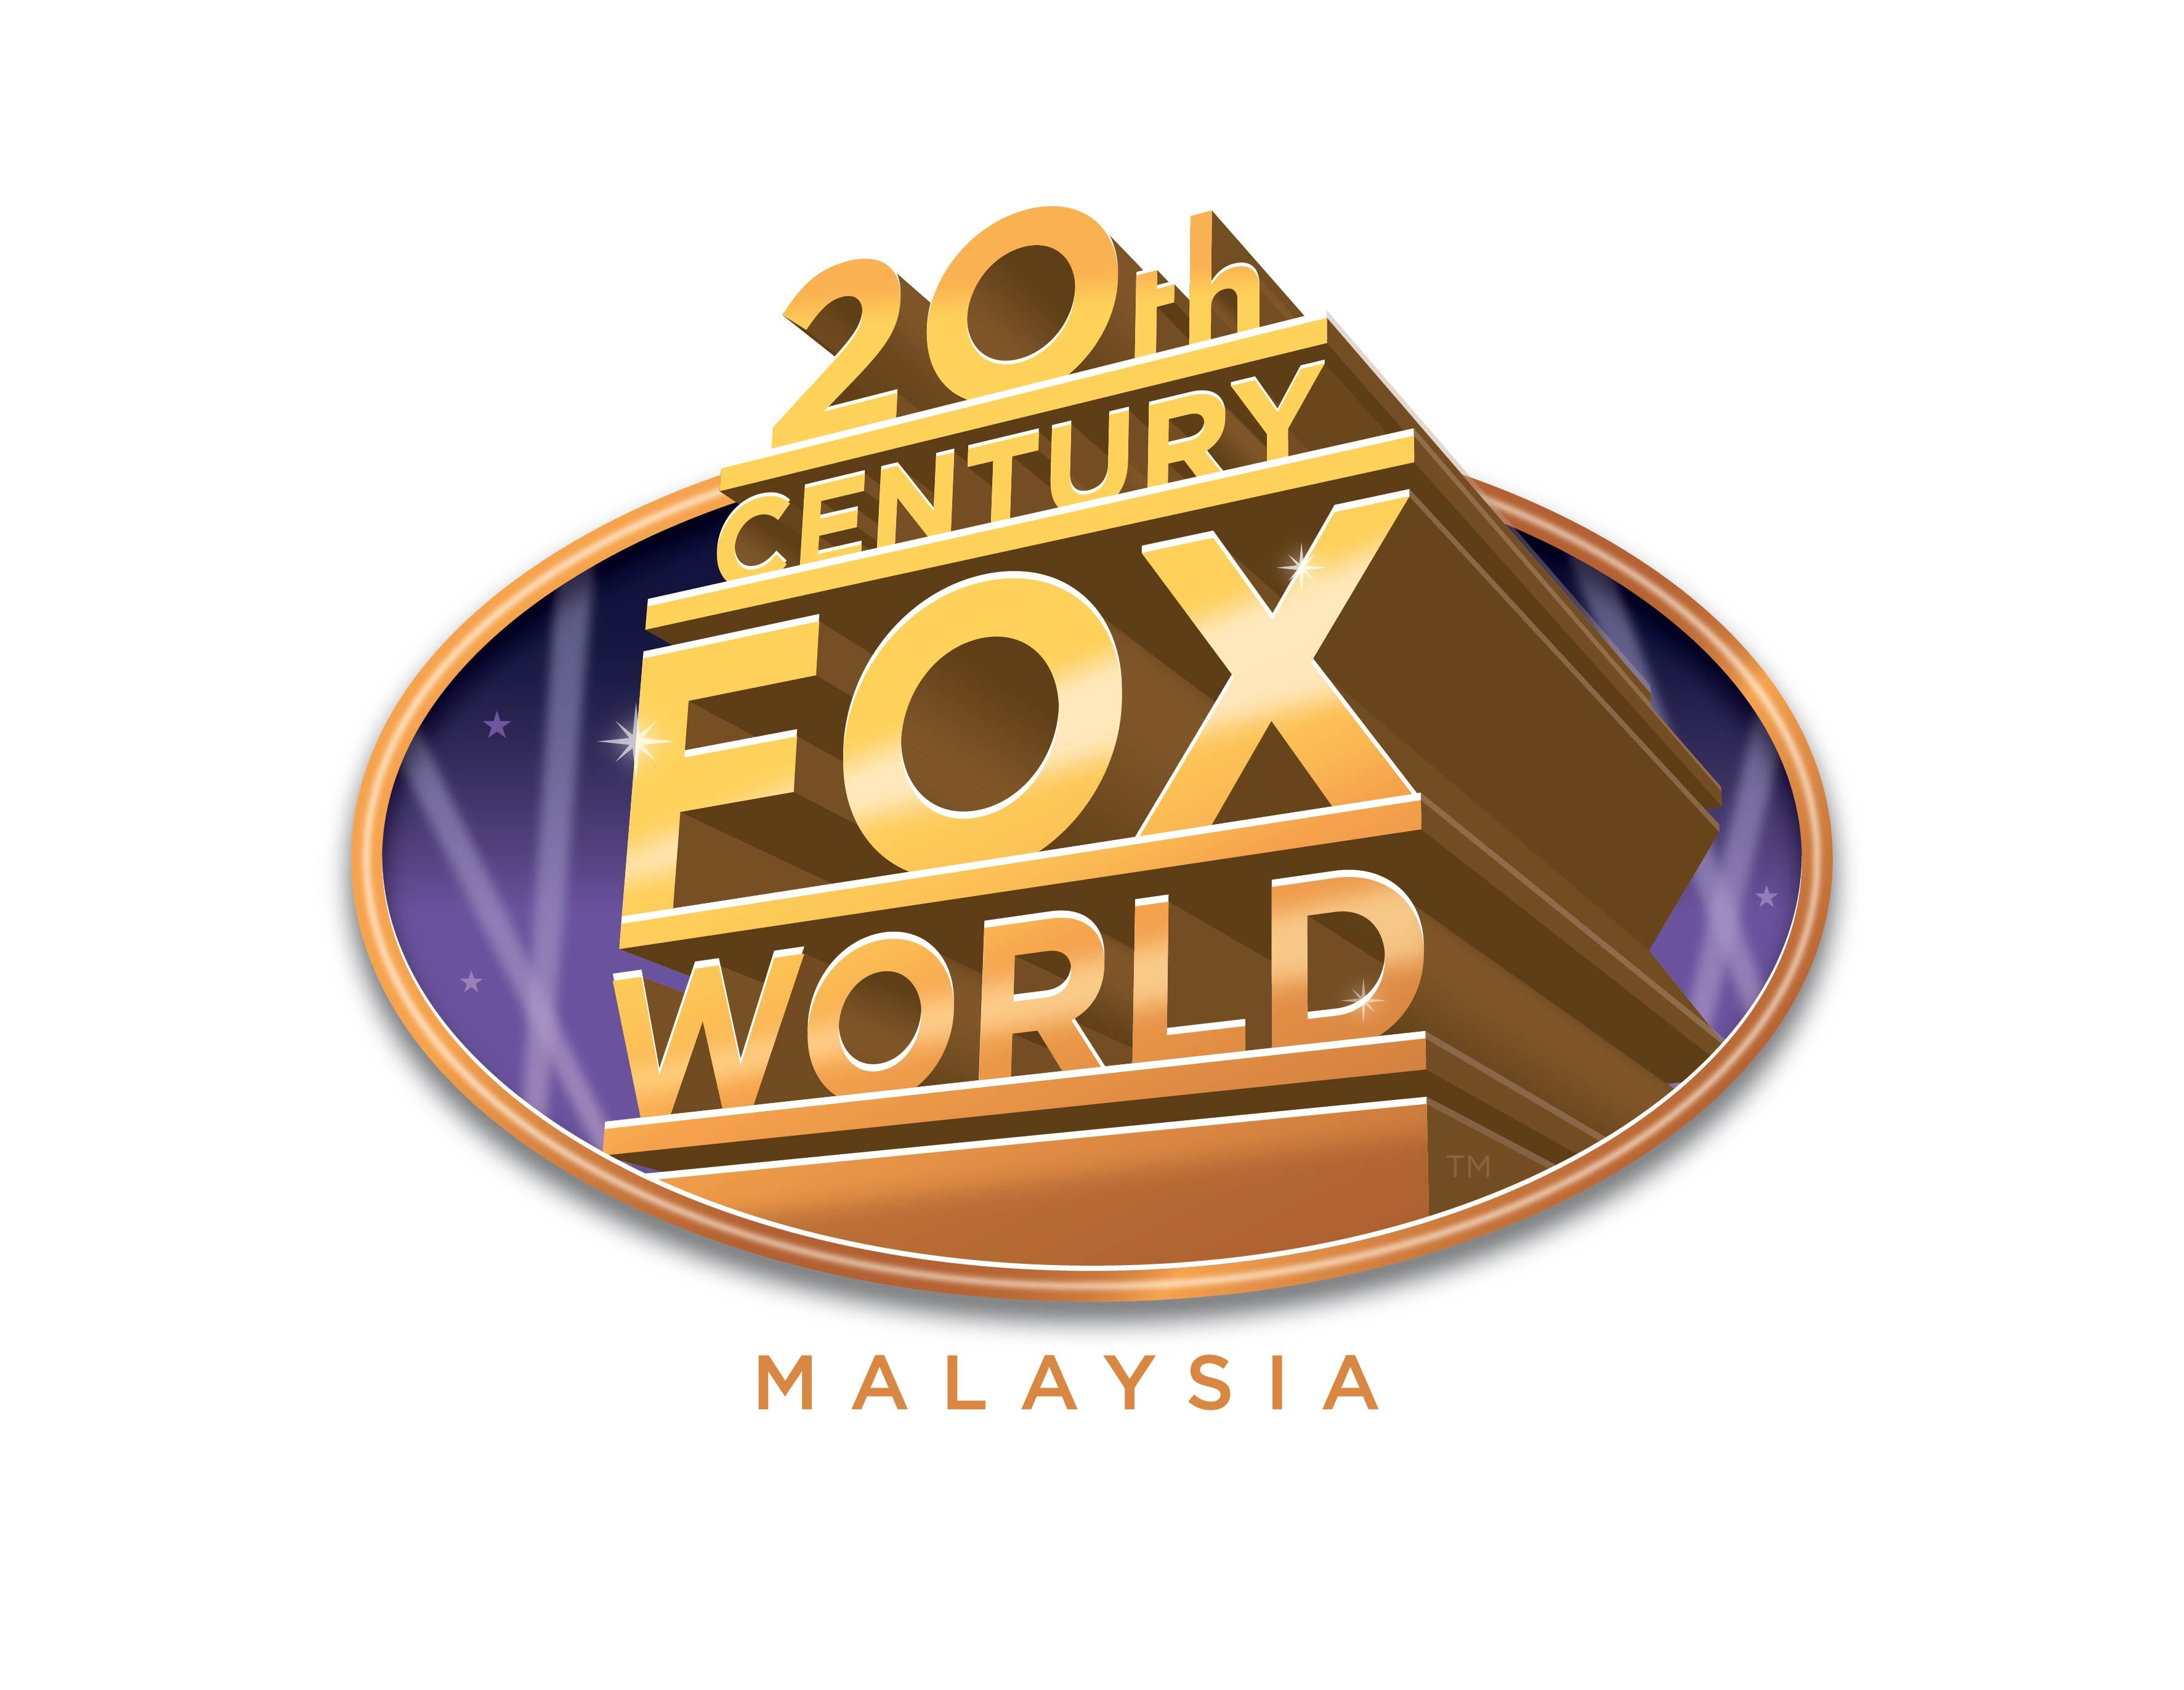 20th Century Fox World logo – Big Kuala Lumpur